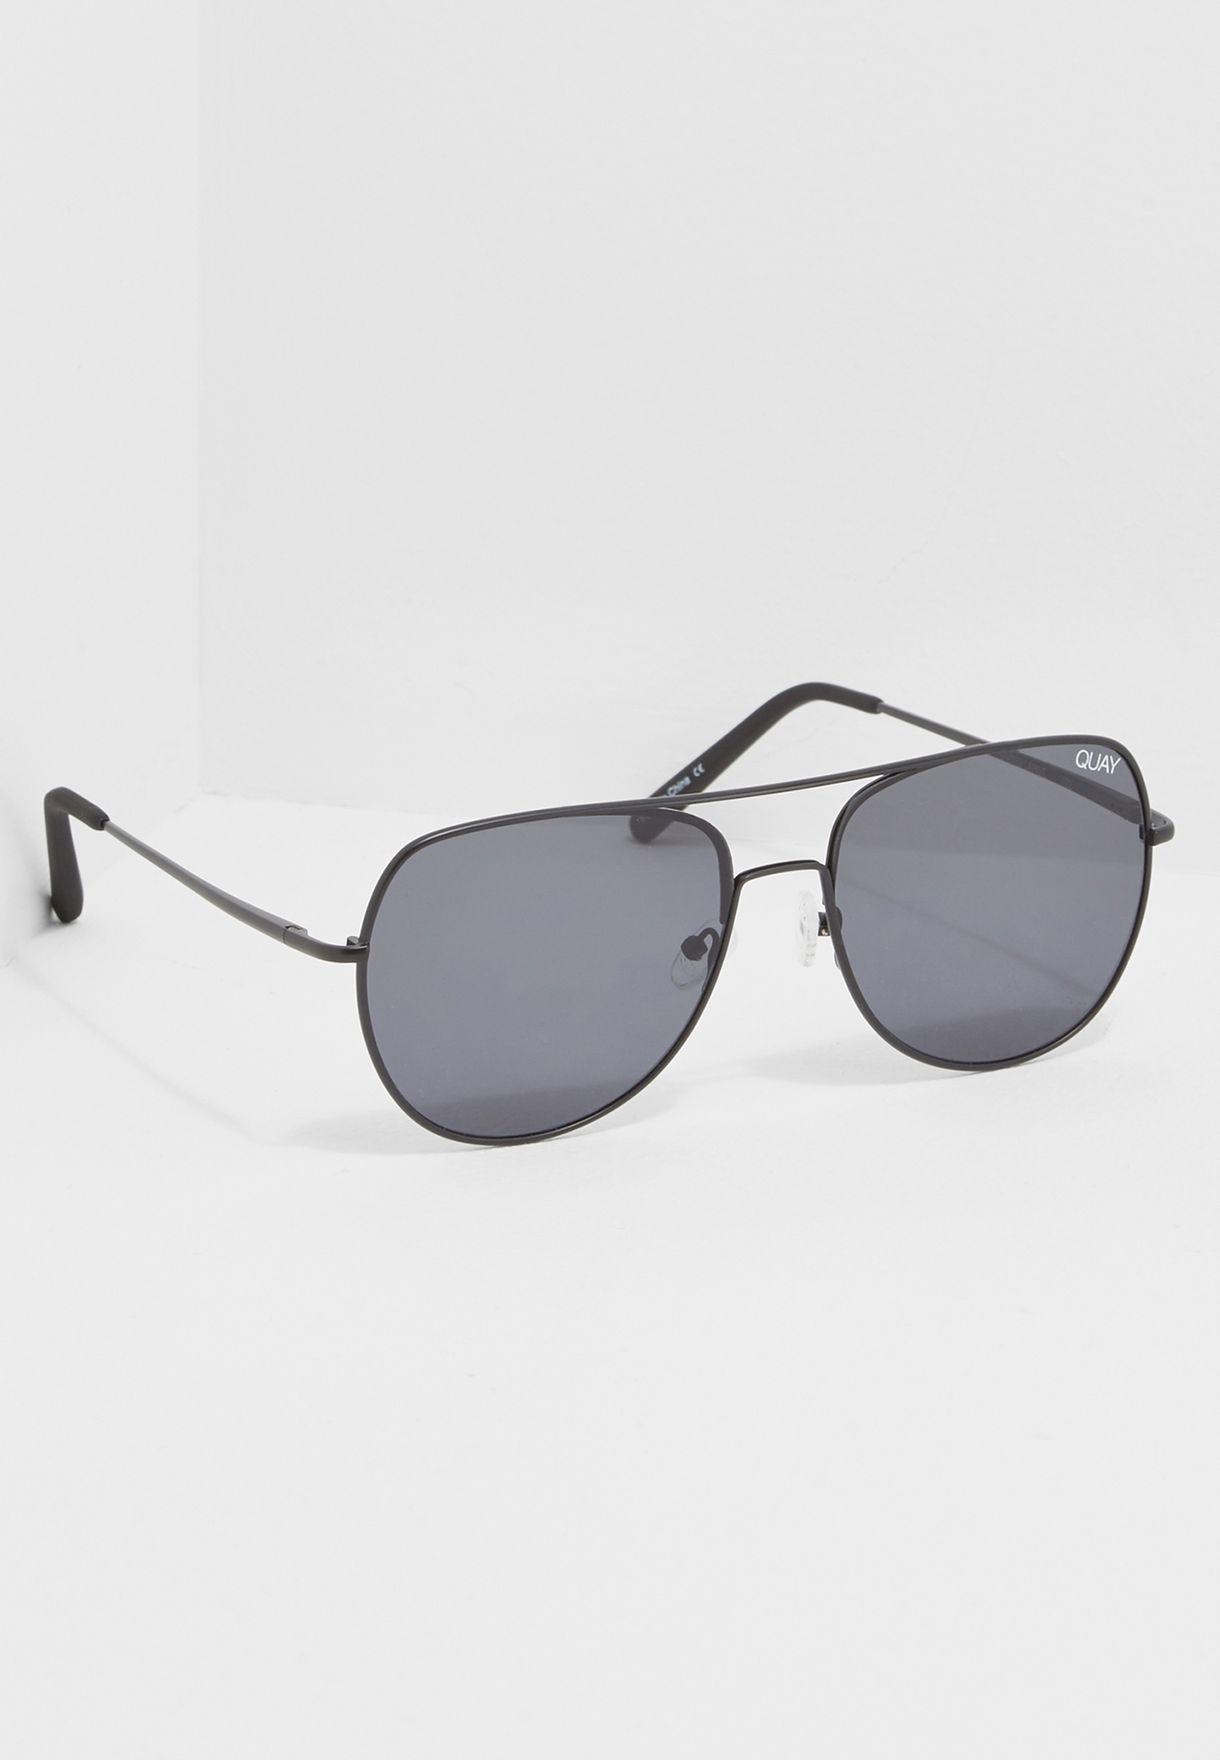 8d505c4bdcb11 Shop Quay Australia black Living Large Sunglasses QM-000200 for Men ...